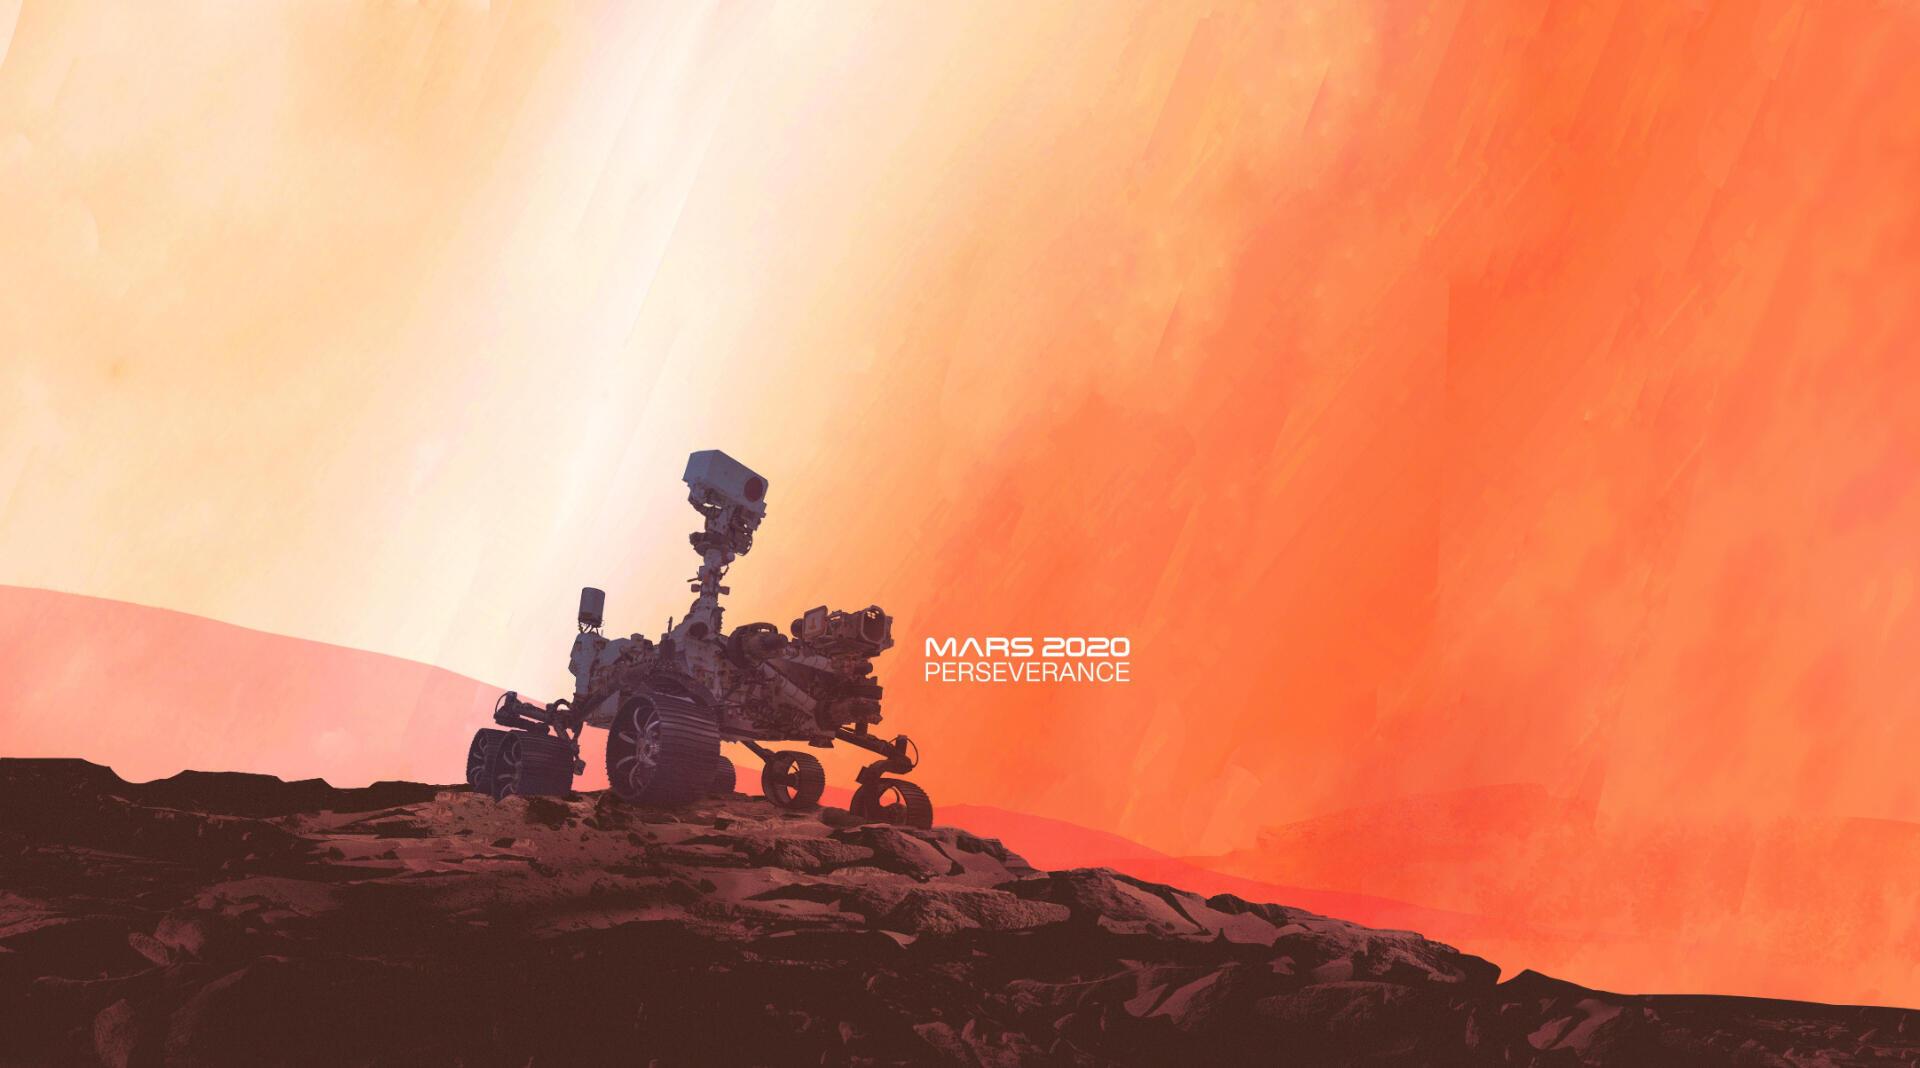 Perseverance on Mars_Illustration2_small